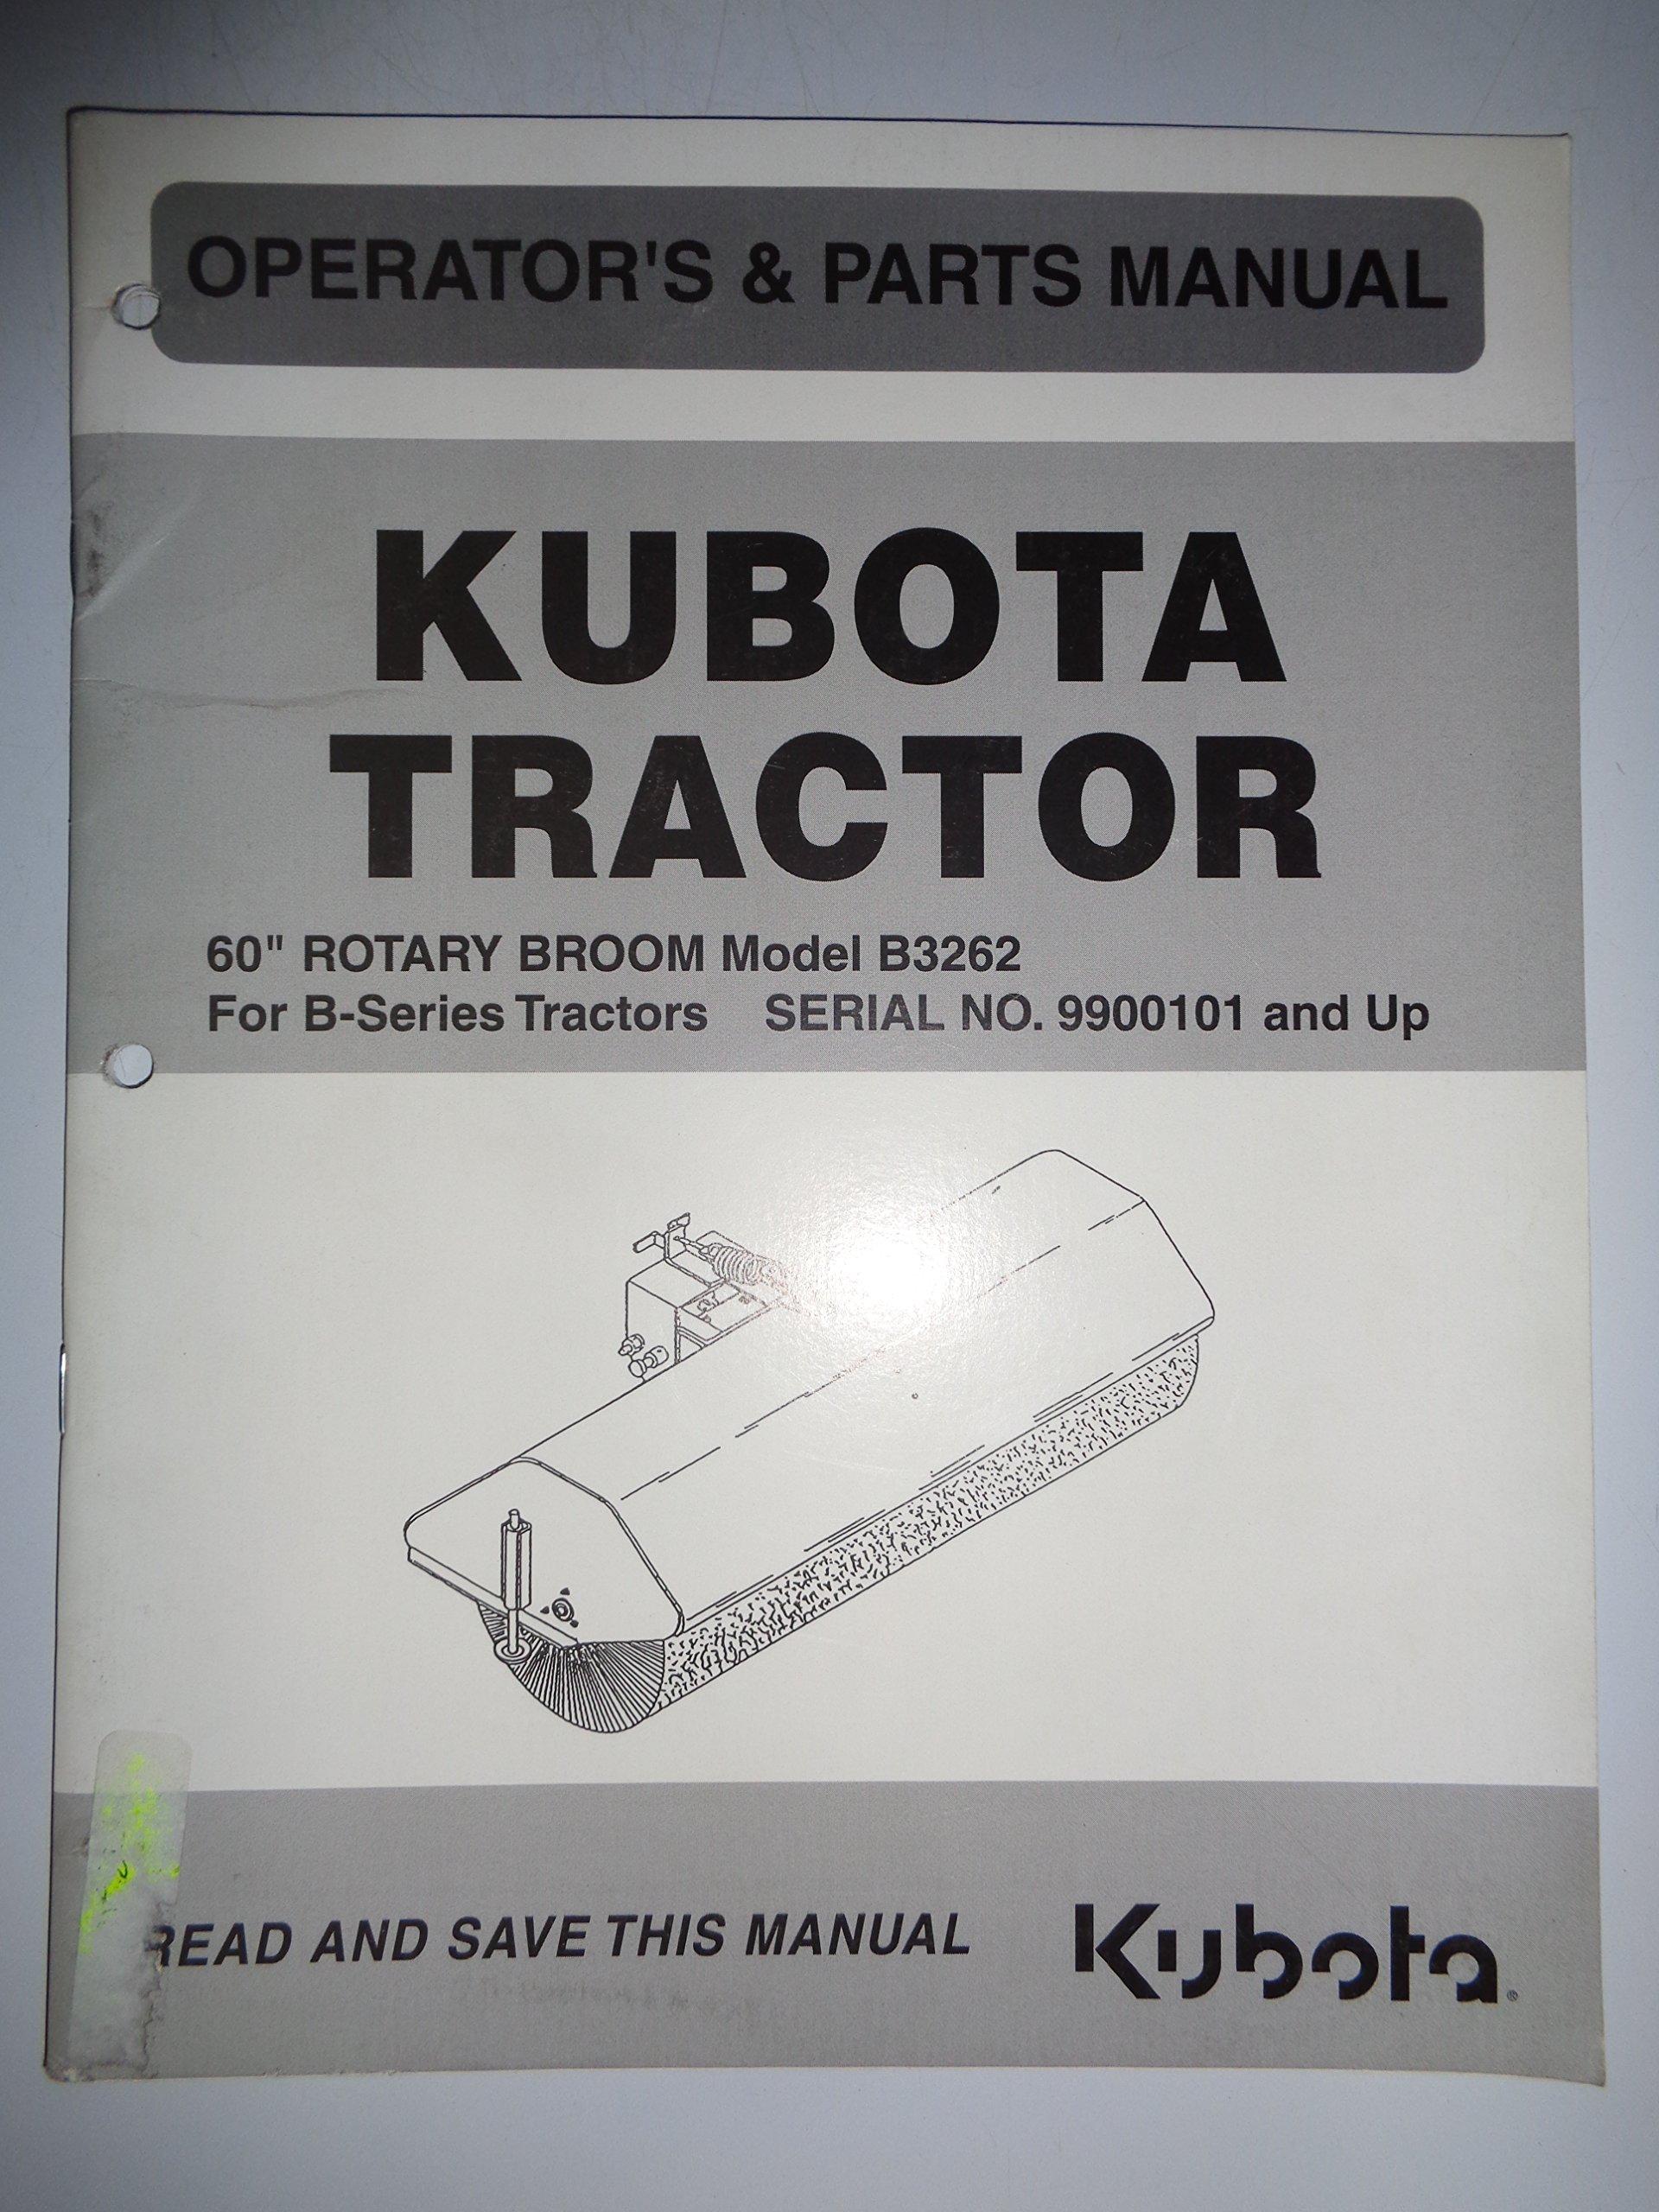 kubota b3262 60 rotary broom for b series tractors parts rh amazon com Kubota L4060 Operators Manual Kubota Tractor Restoration